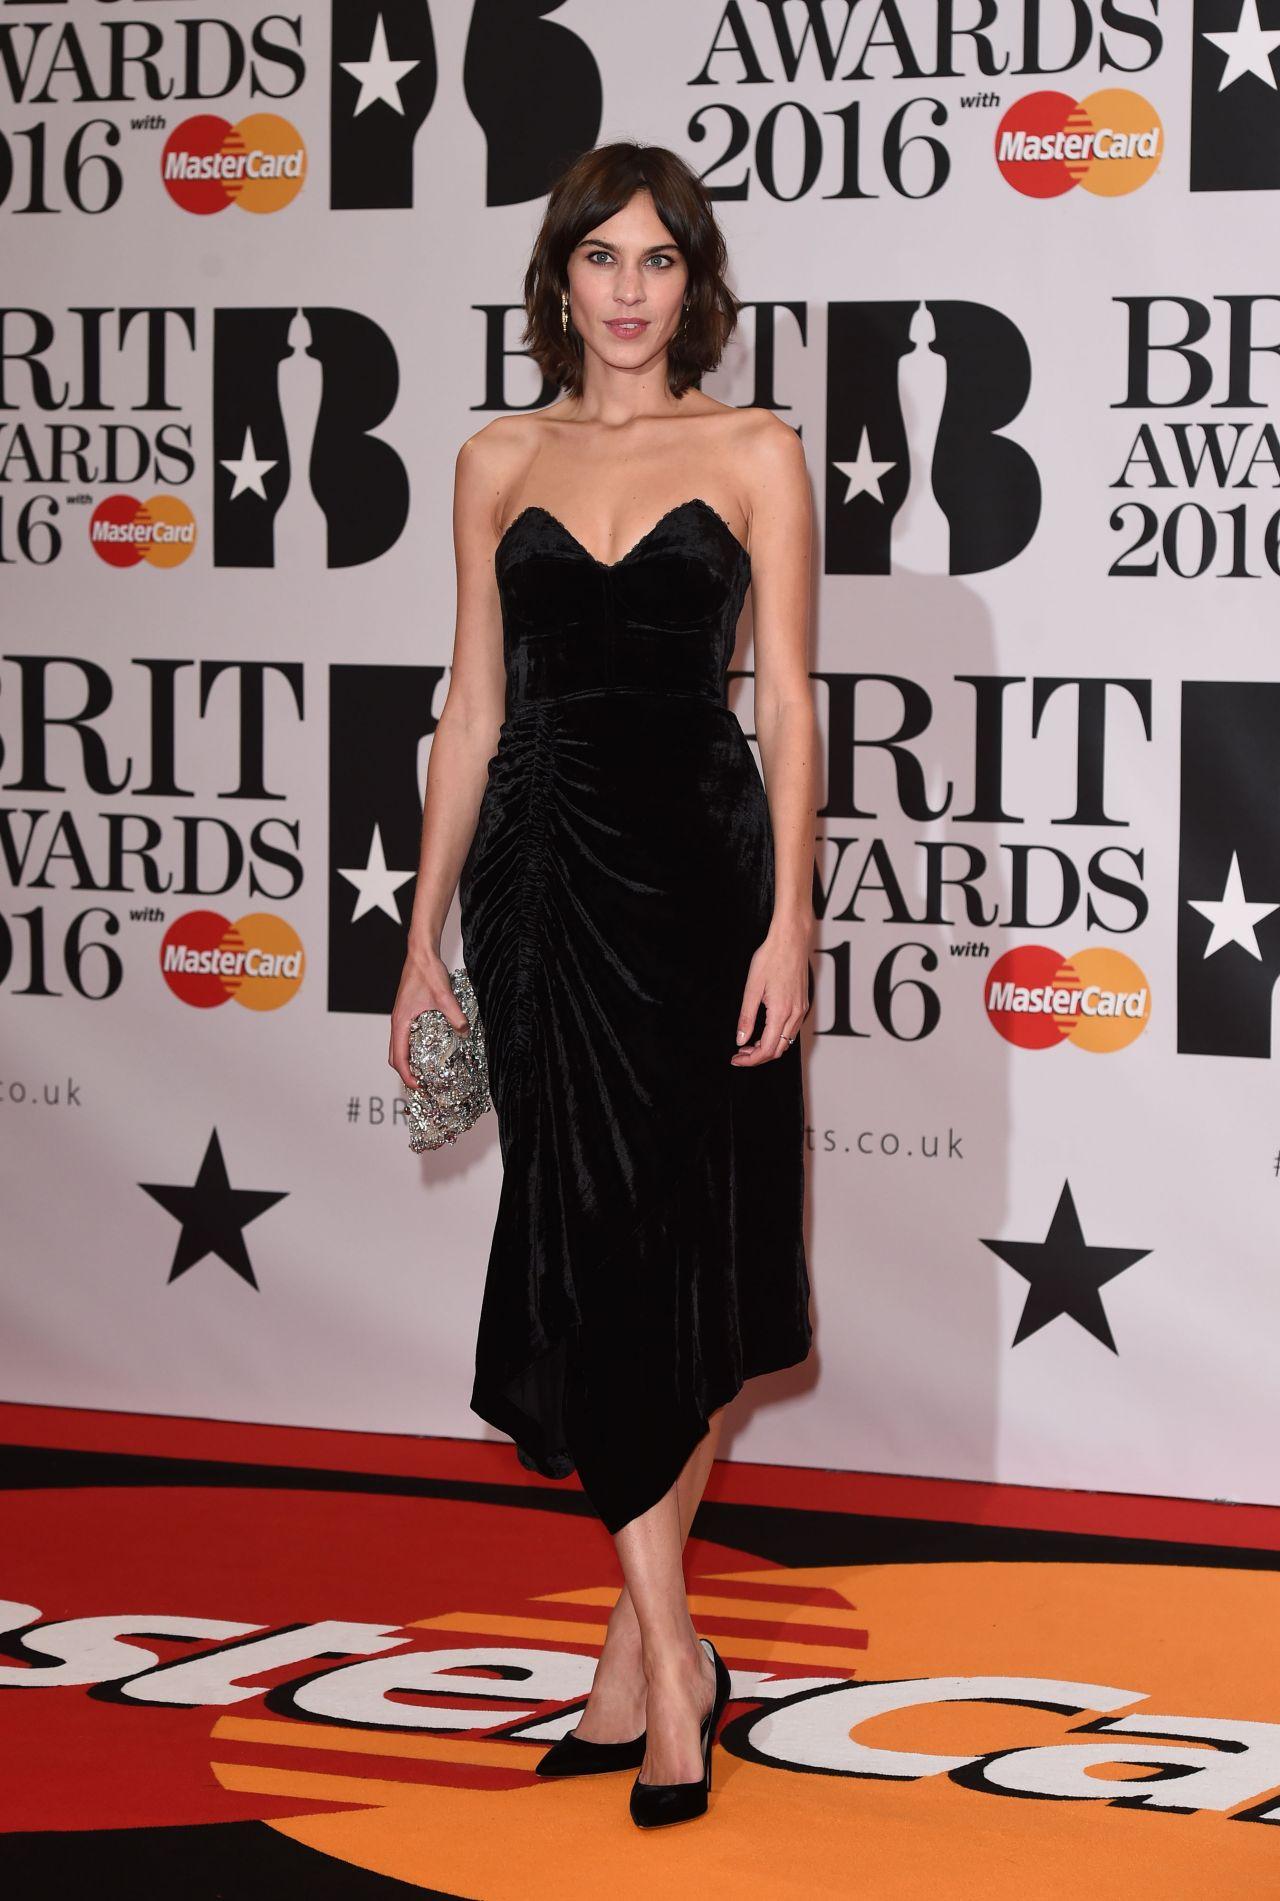 alexa-chung-brit-awards-2016-in-london-uk-1